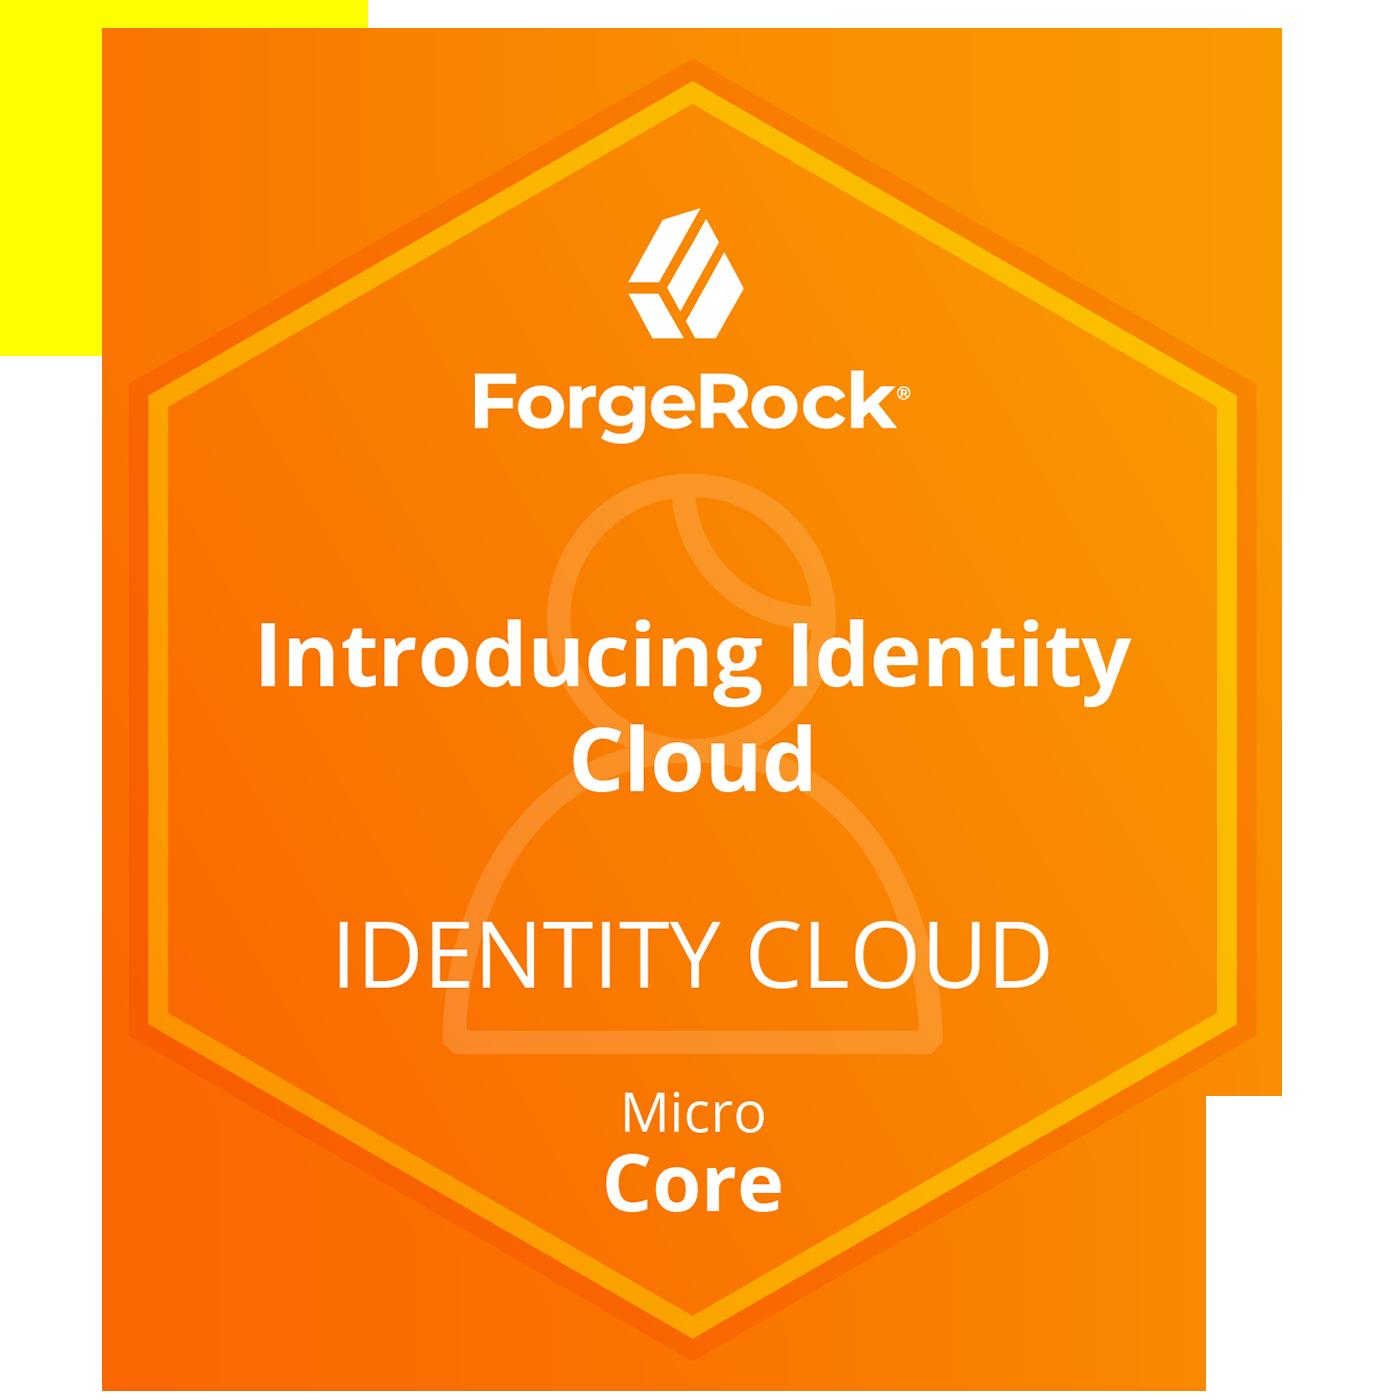 ForgeRock Identity Cloud Micro Core Skills - Introducing ForgeRock Identity Cloud